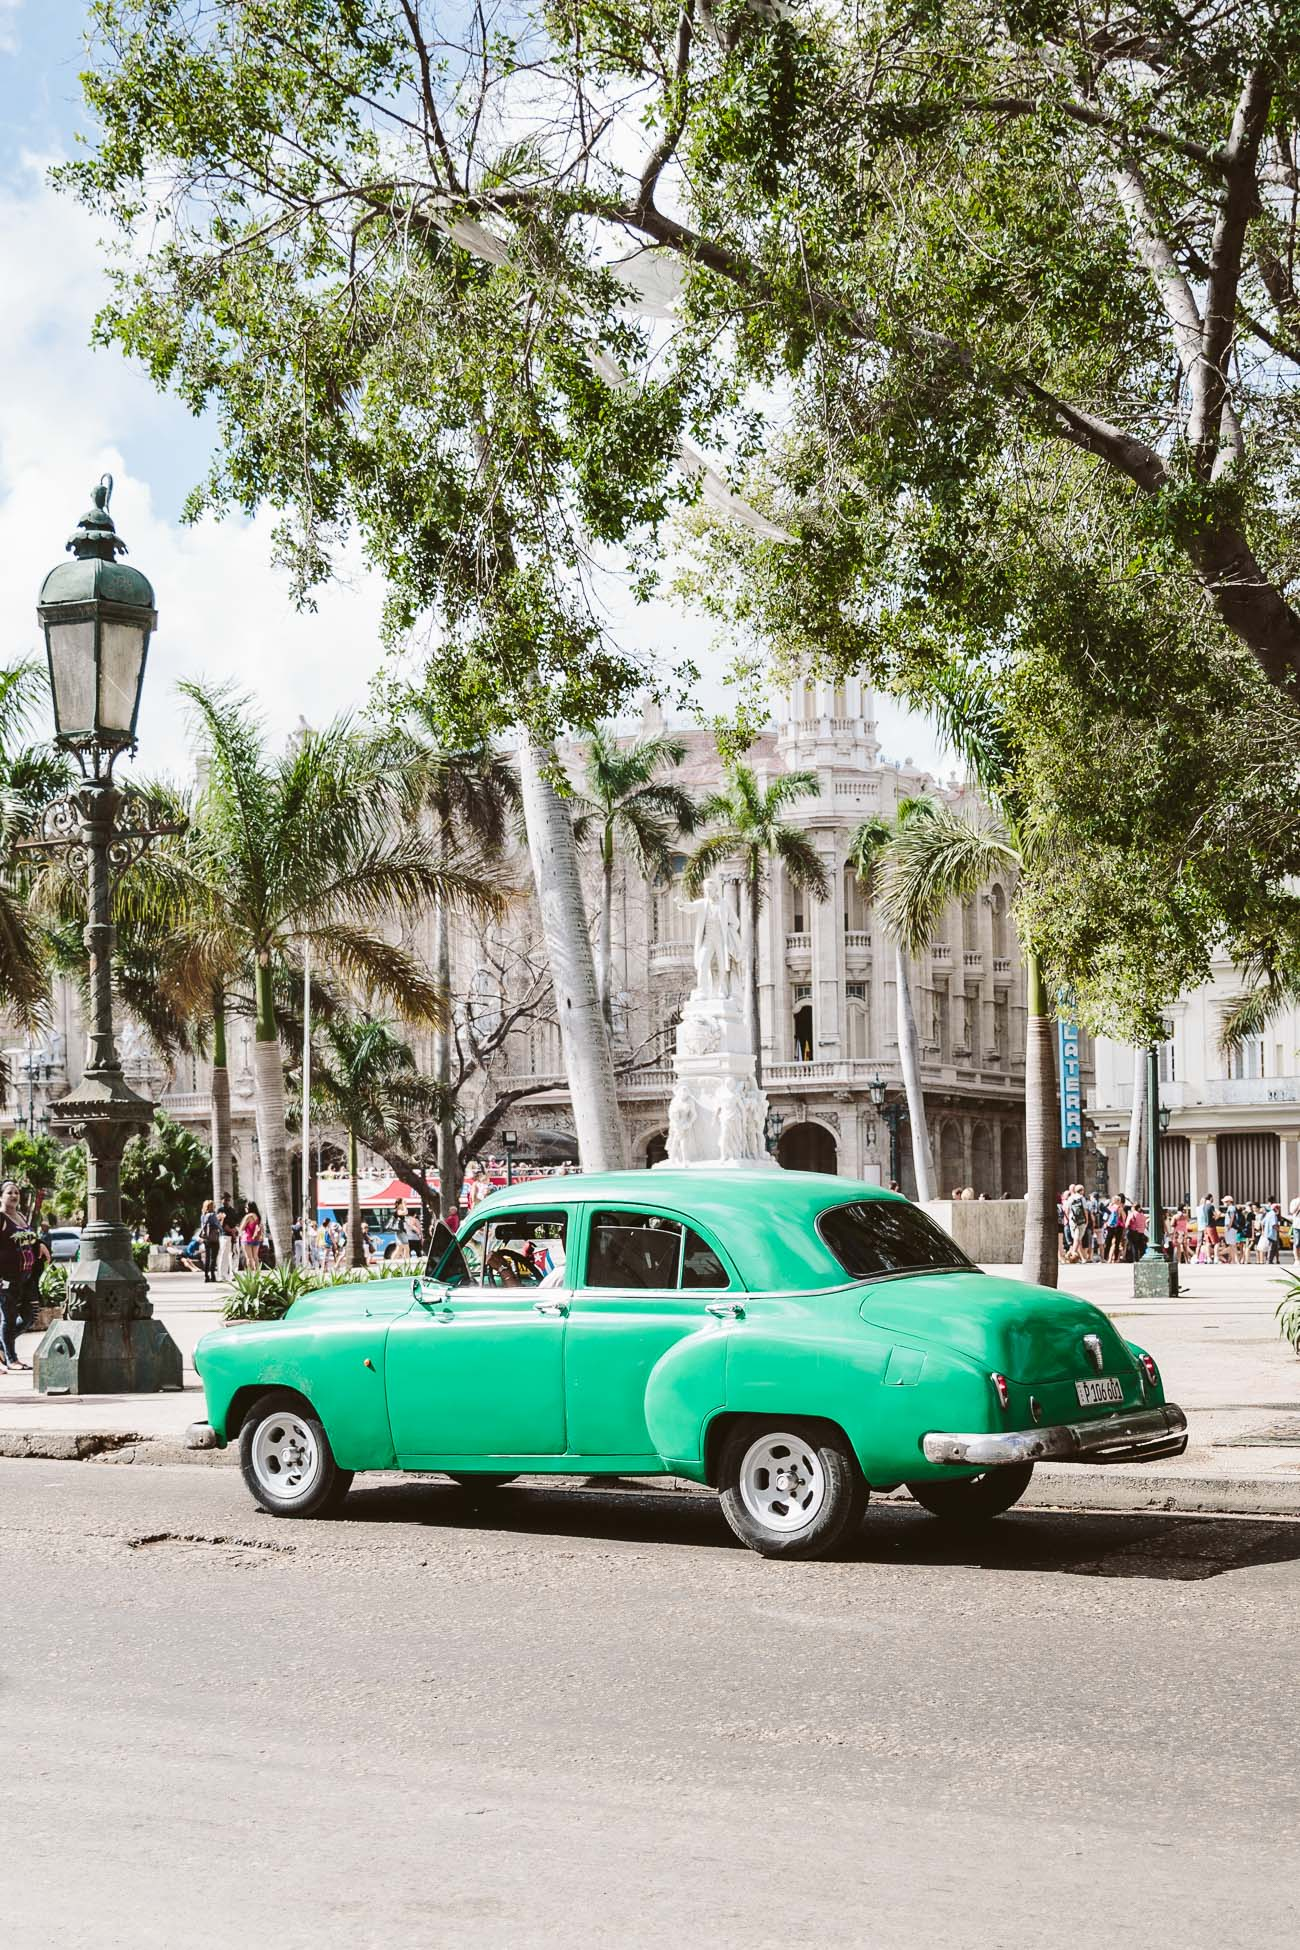 Vintage car in Havana Cuba